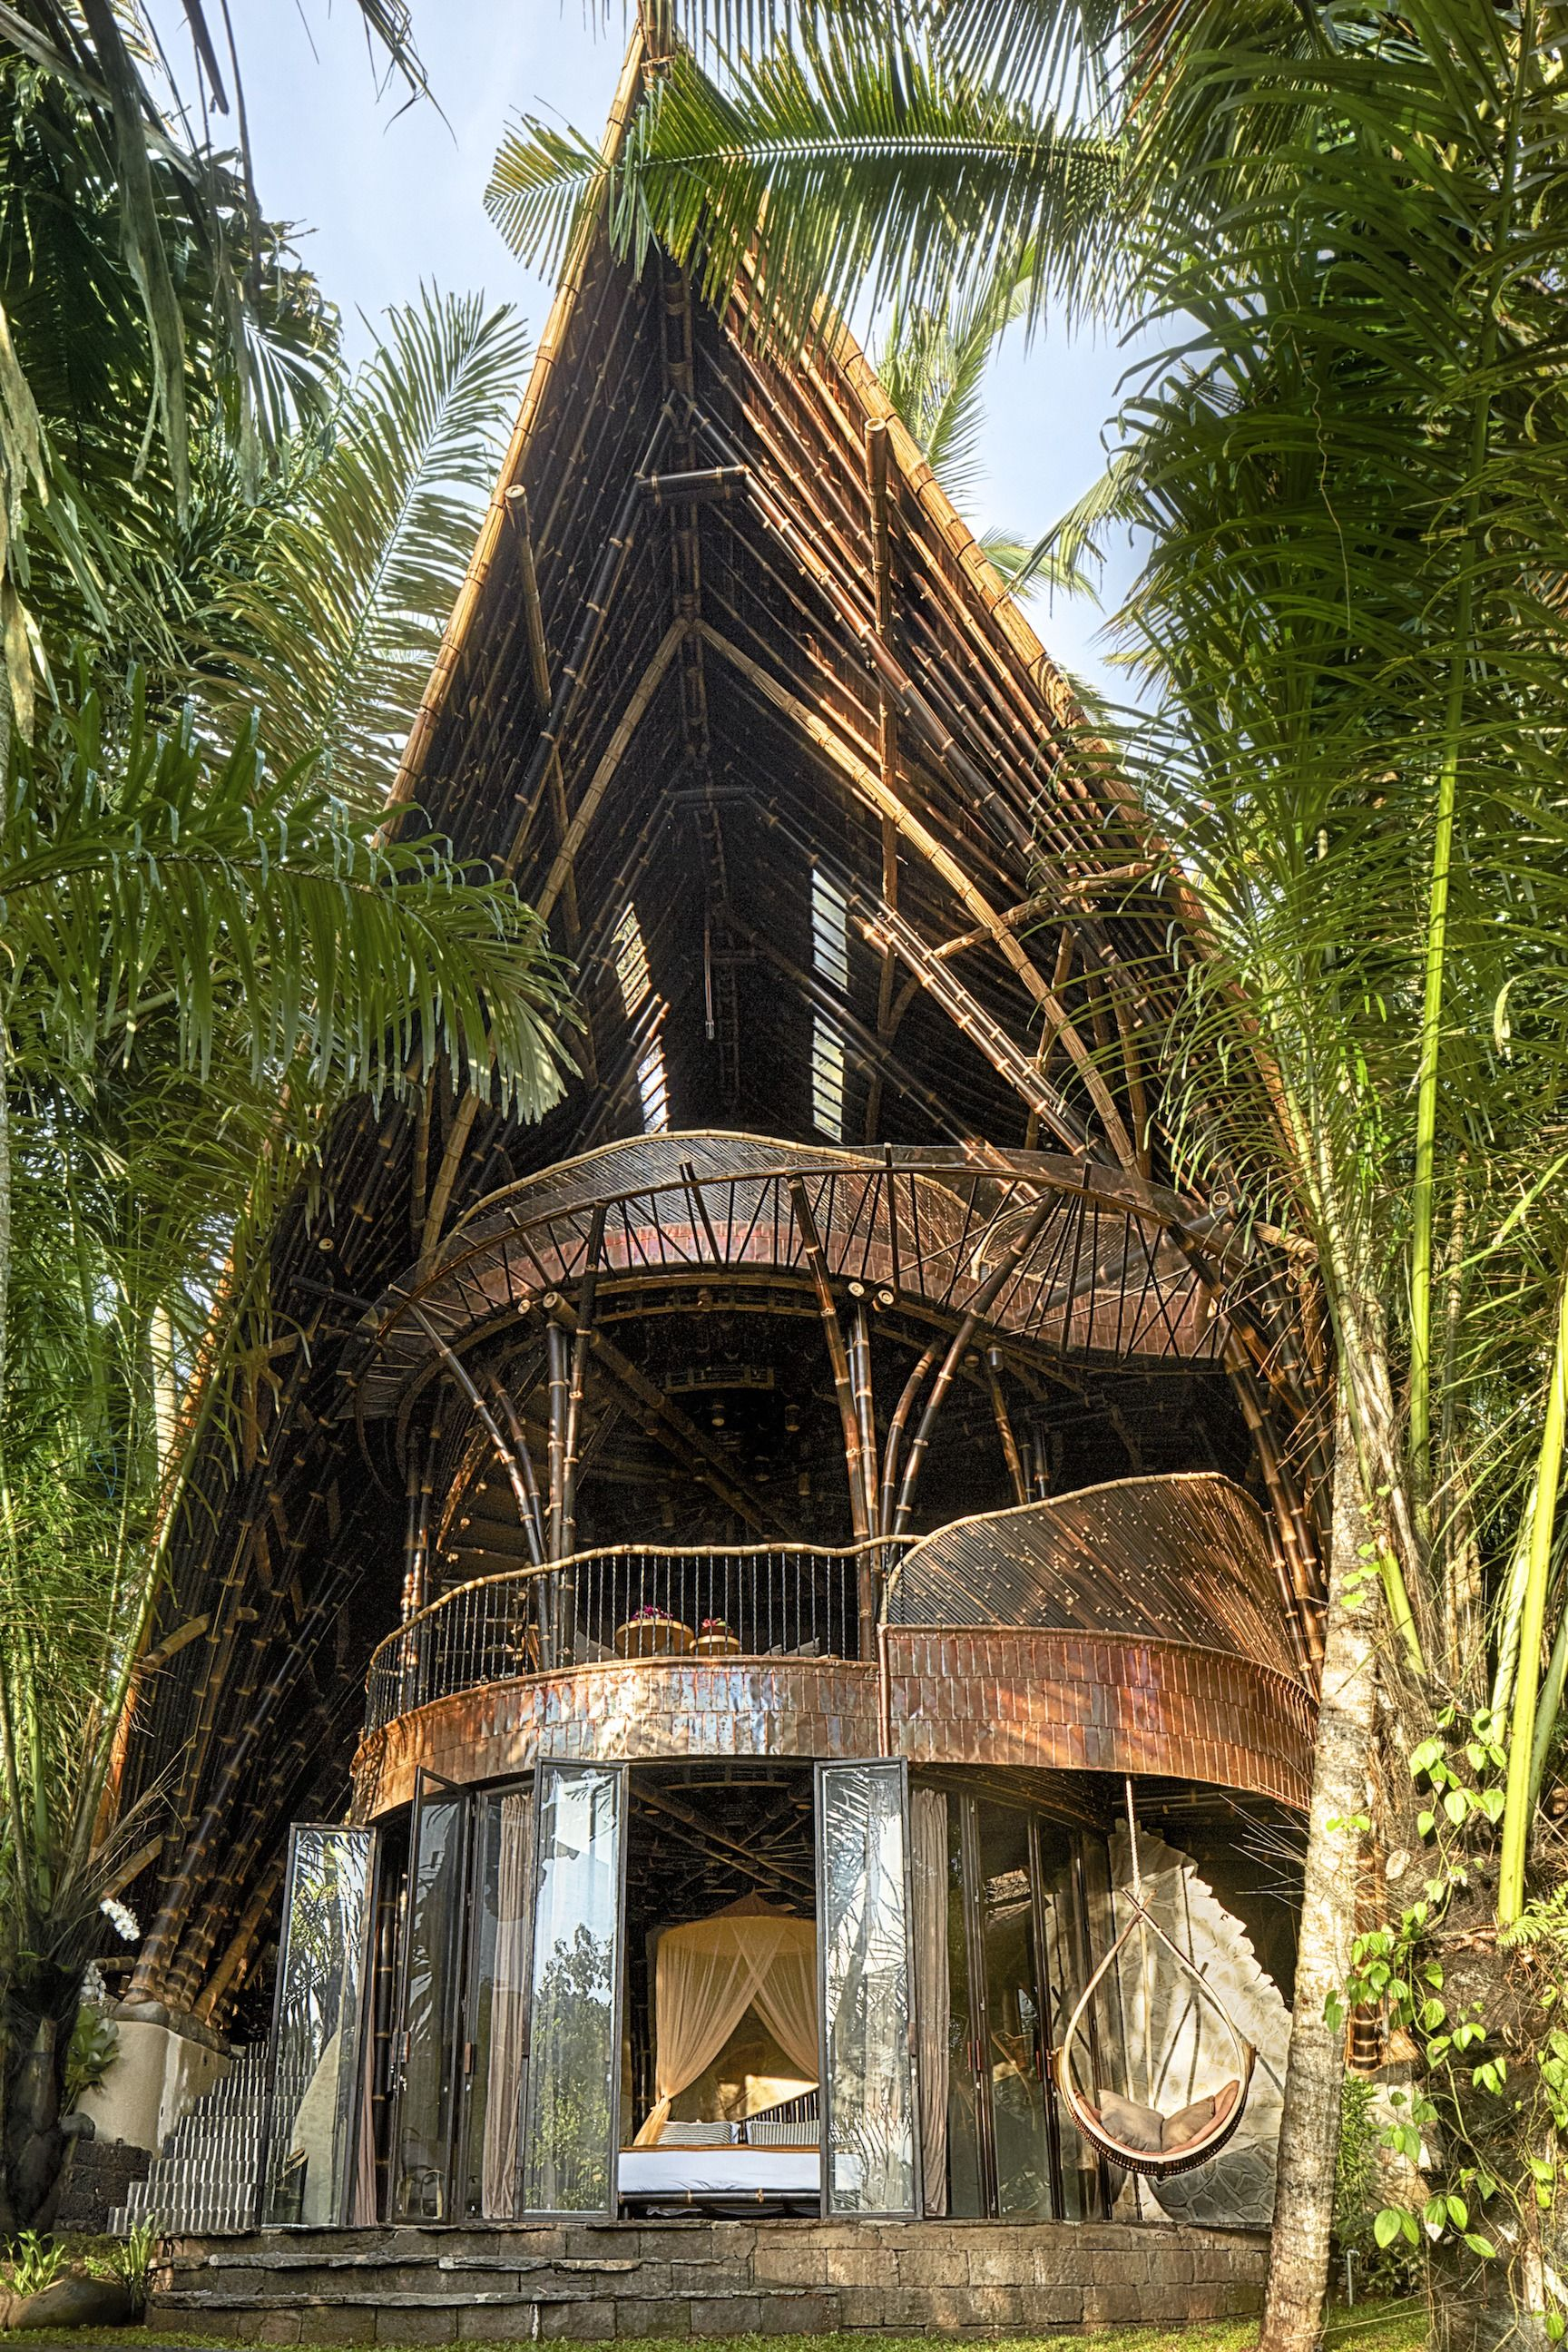 Bamboo Villa in Indonesia